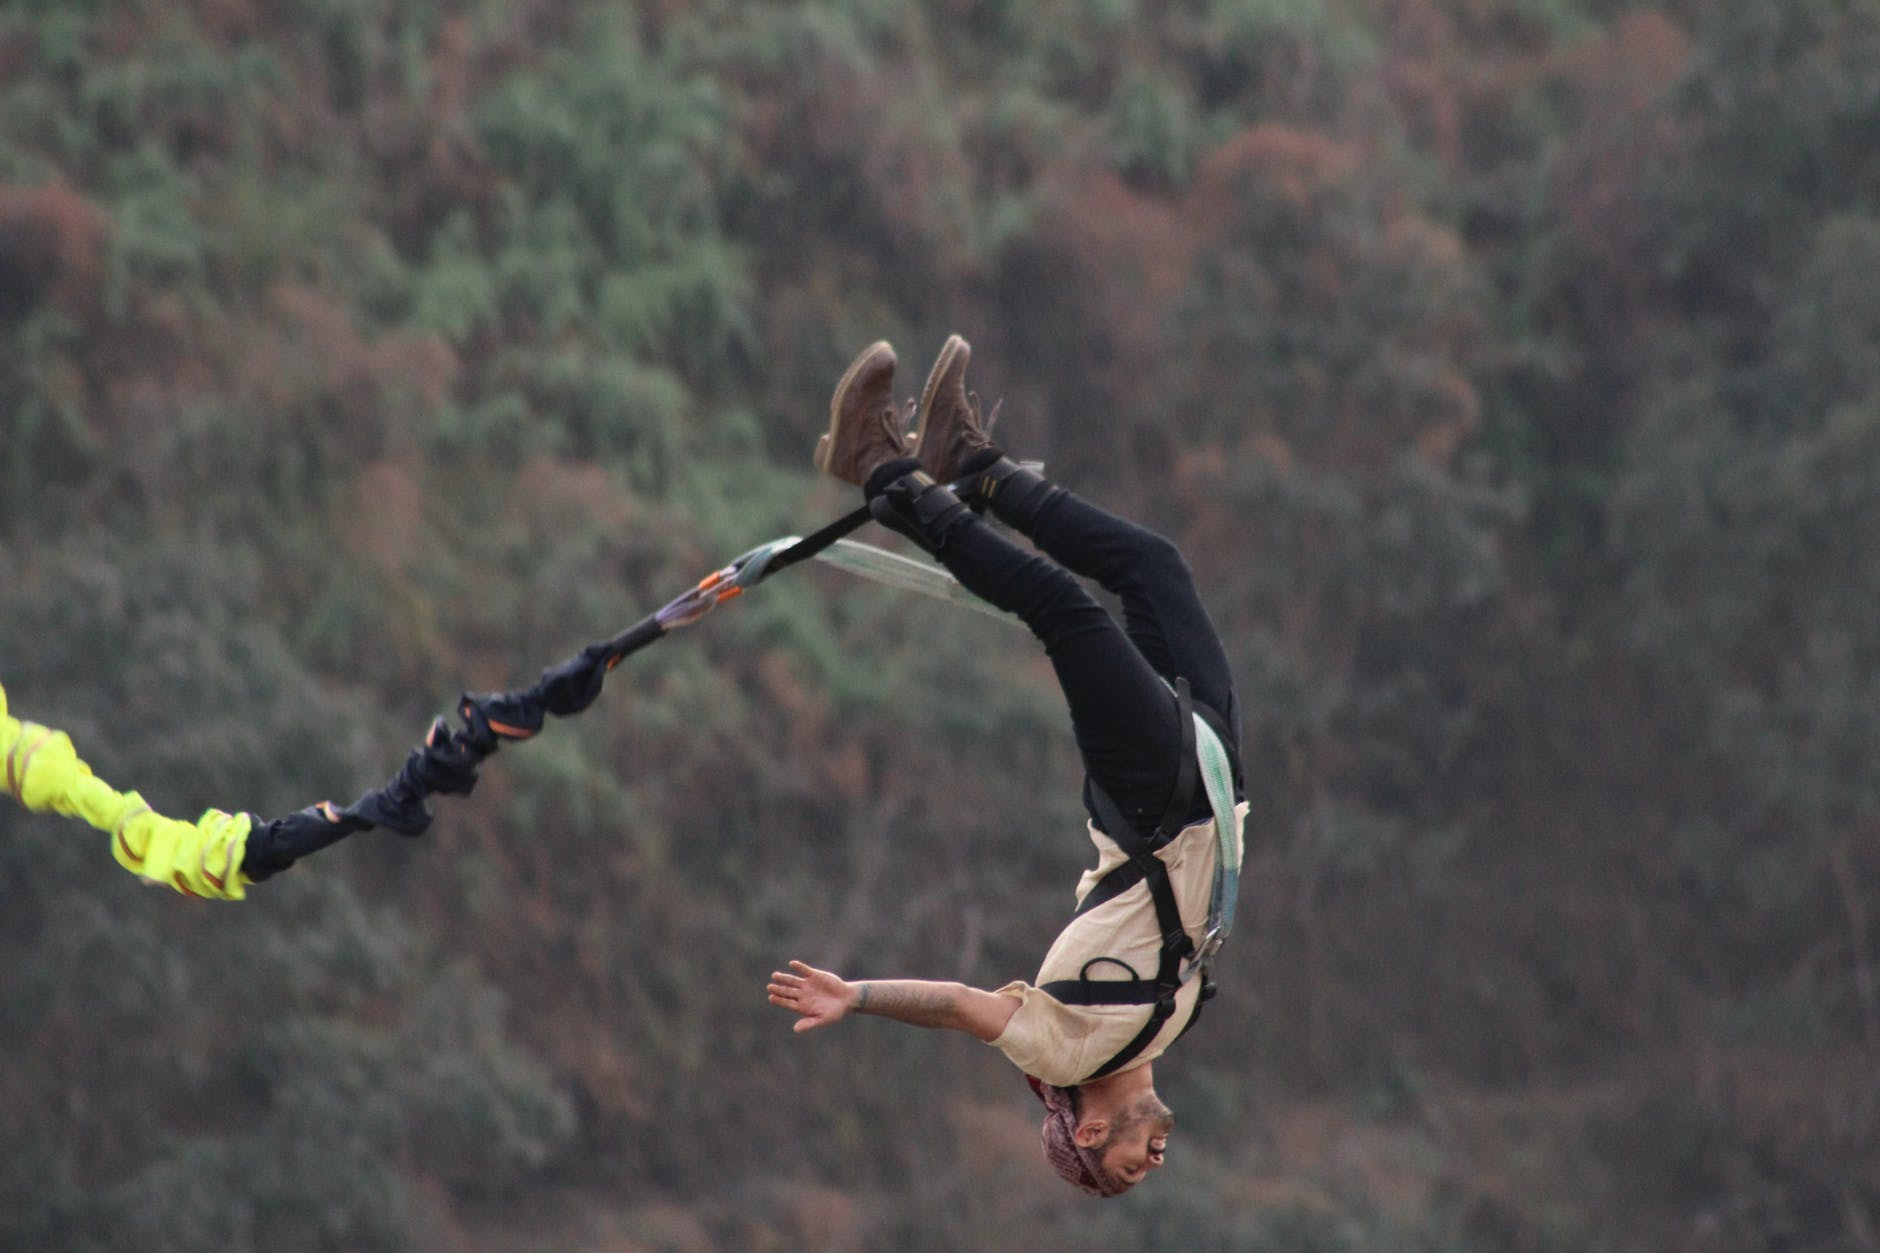 Bungee jumping11